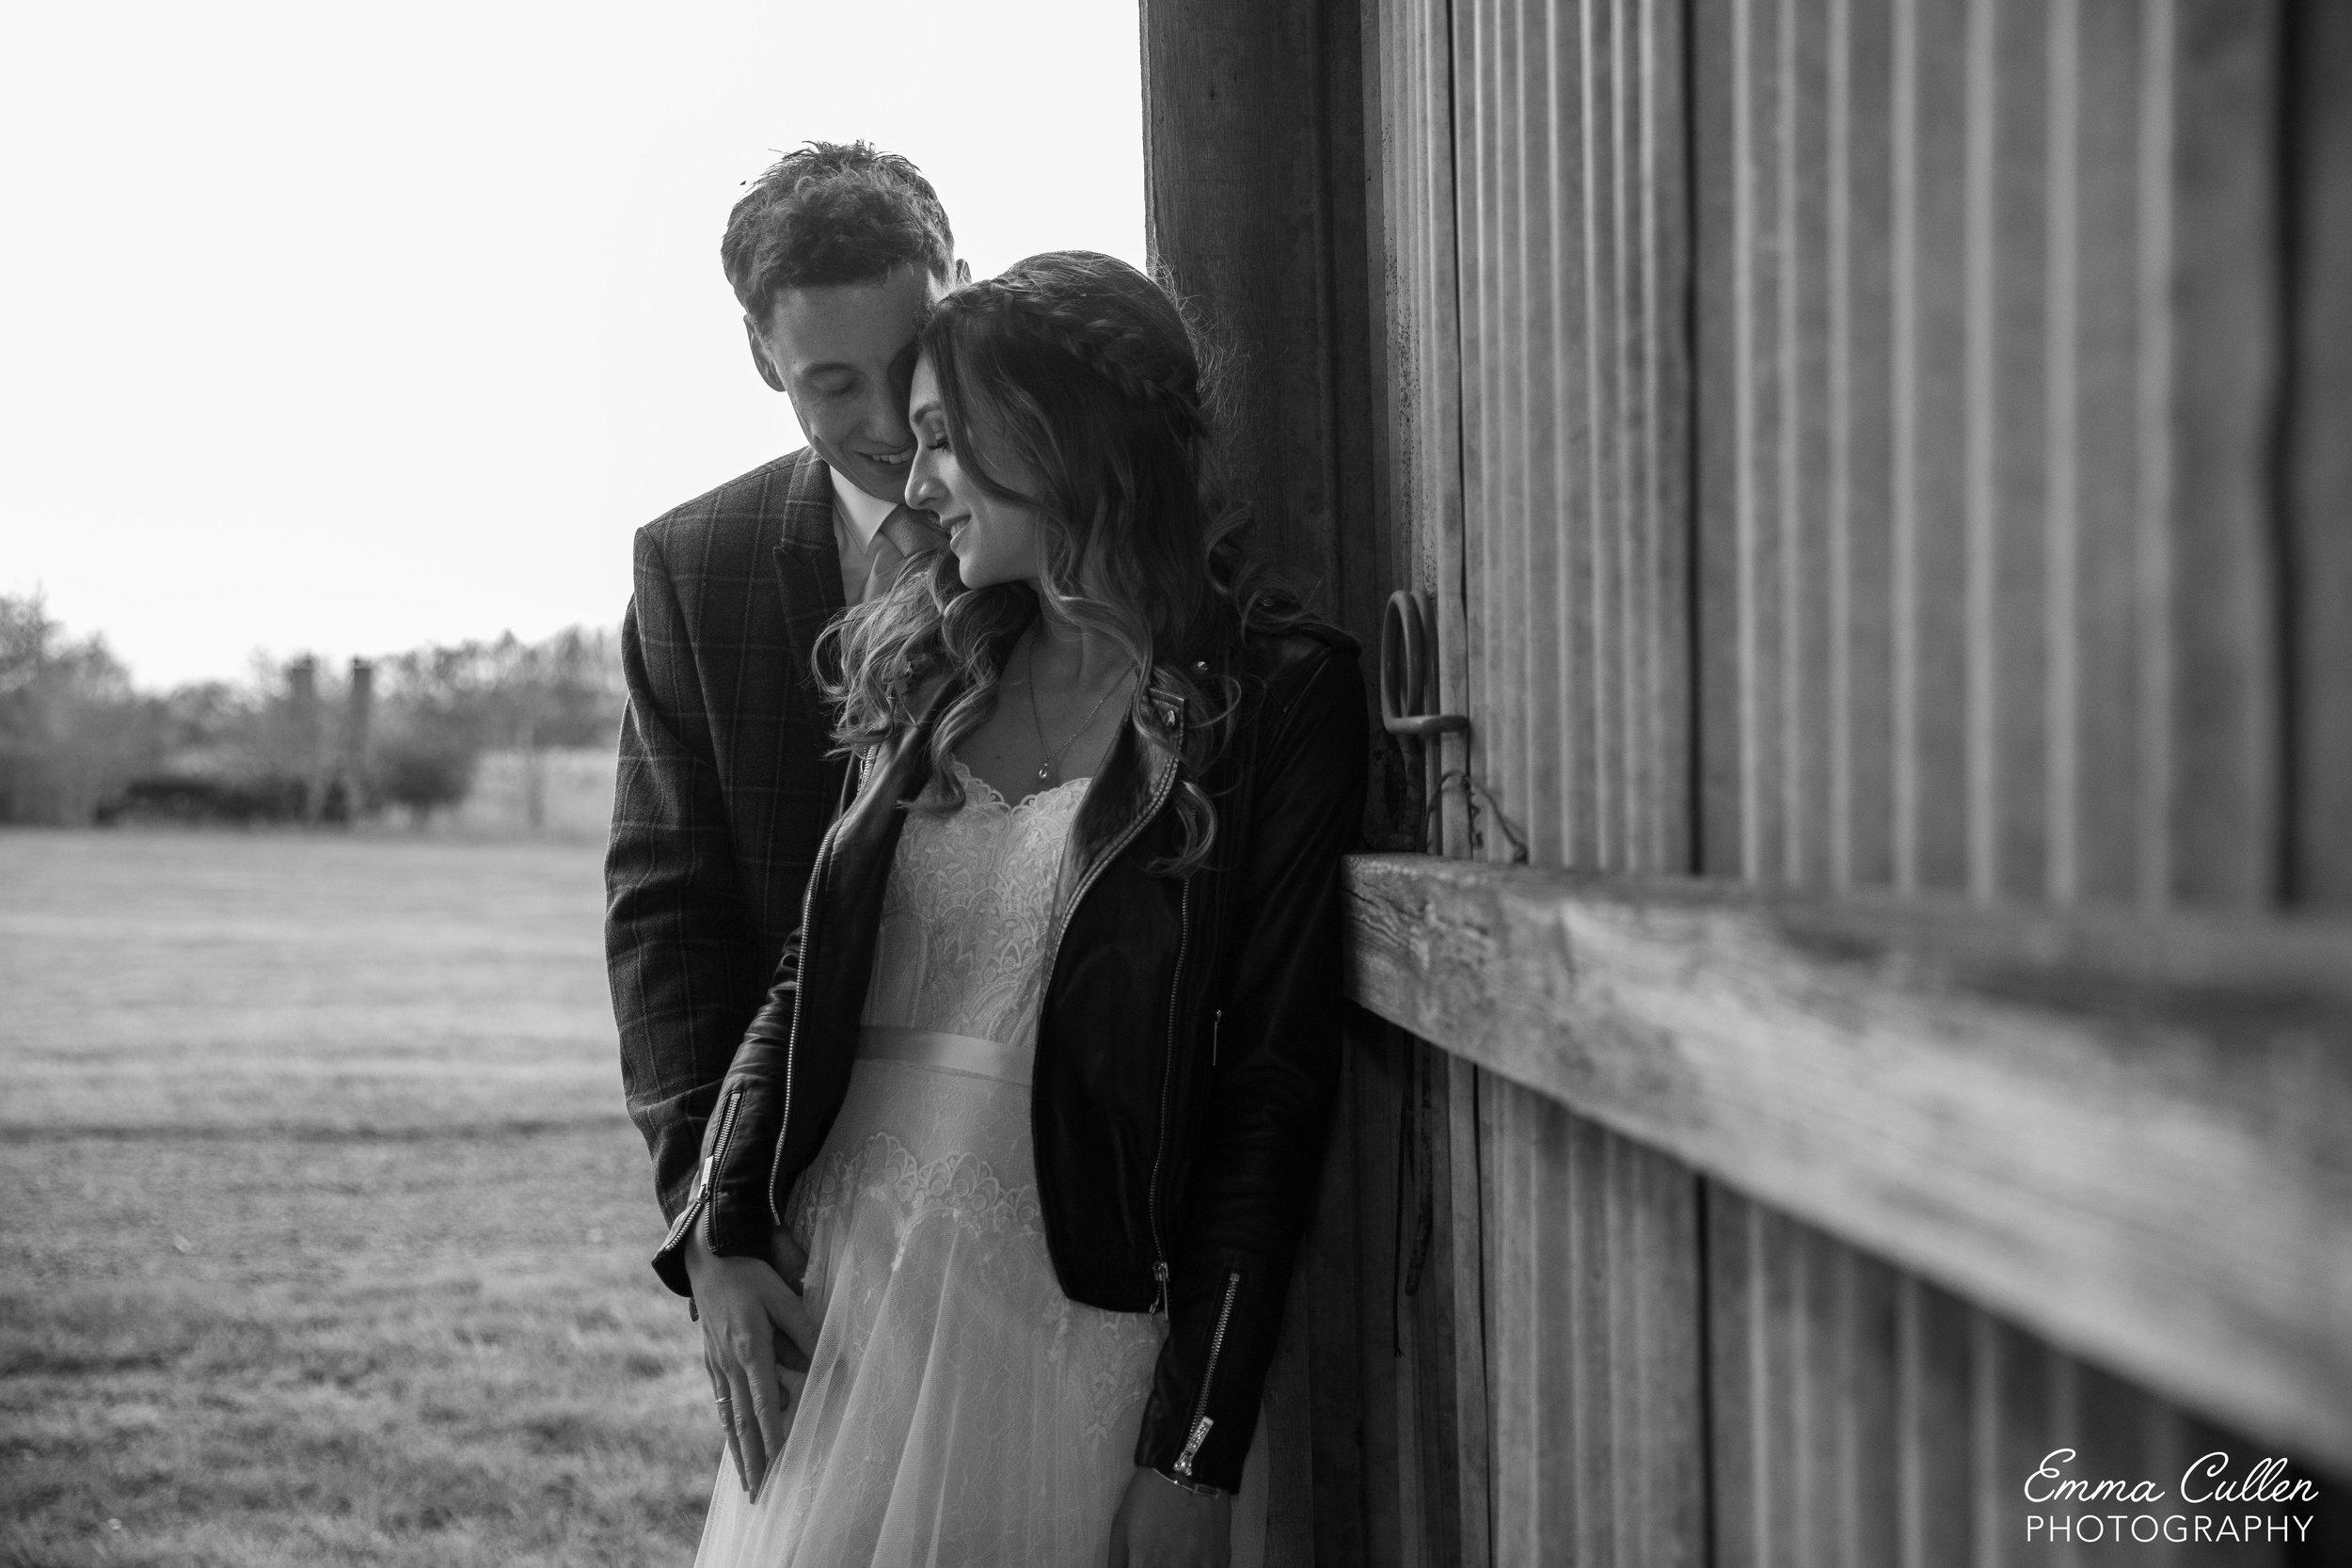 SM; Dobinsteen Wedding 13.04.19-1-8.jpg